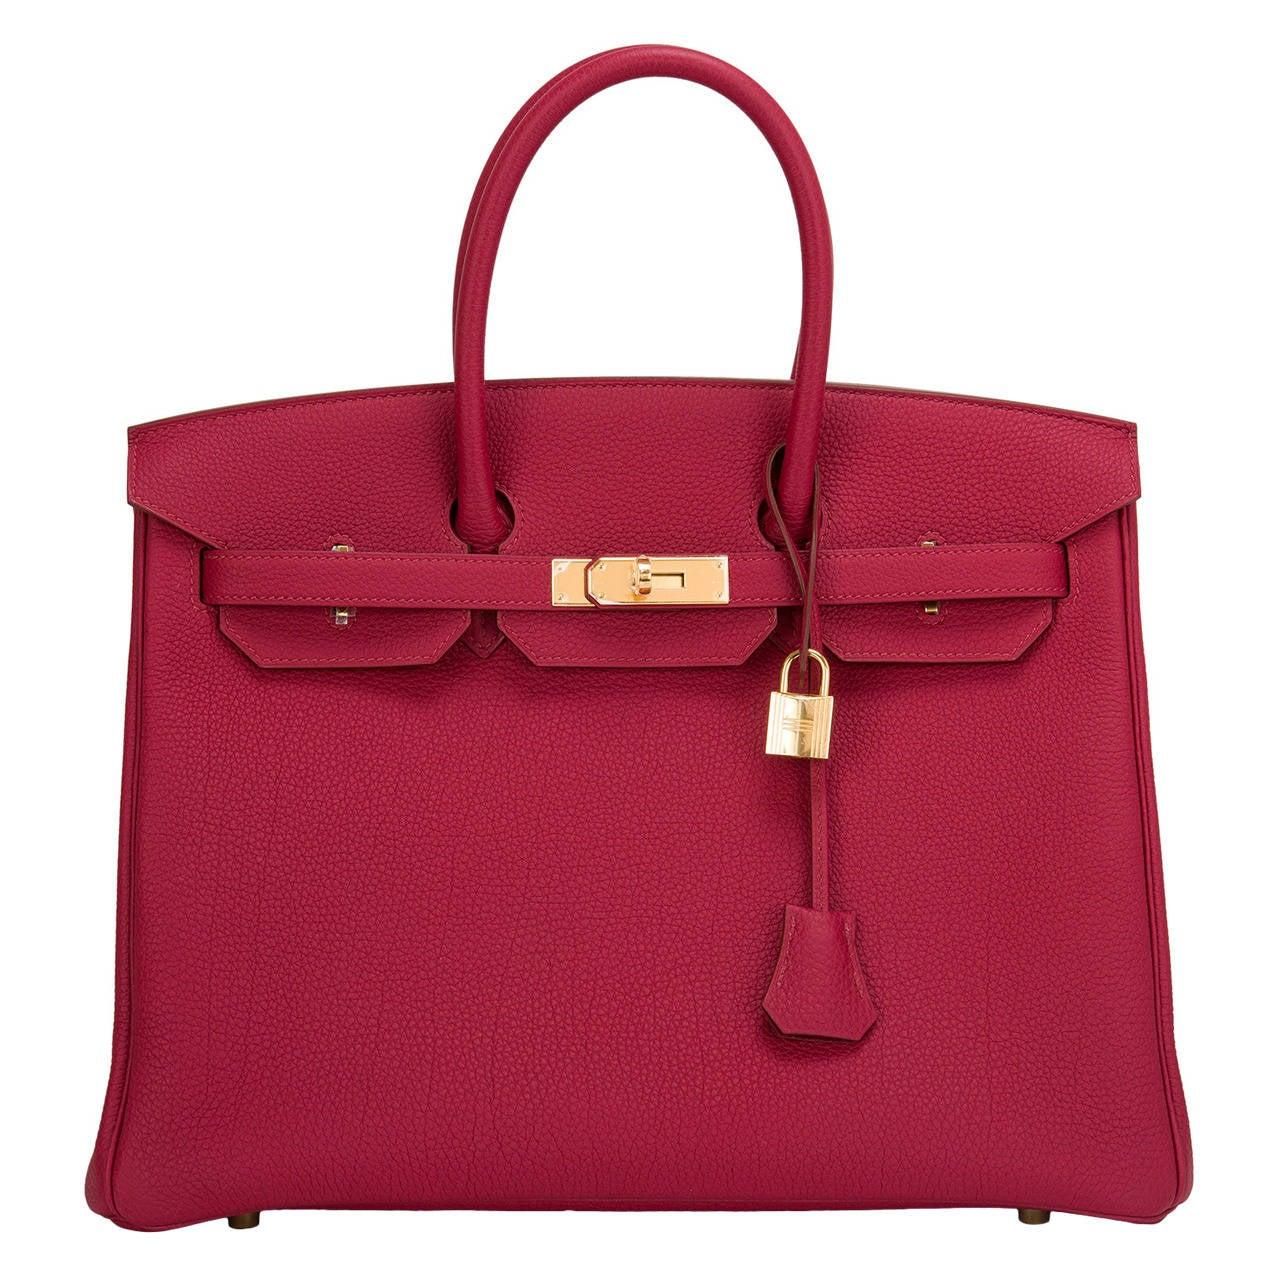 hermes paris handbags - Hermes Rubis Togo Birkin 35cm Gold Hardware at 1stdibs